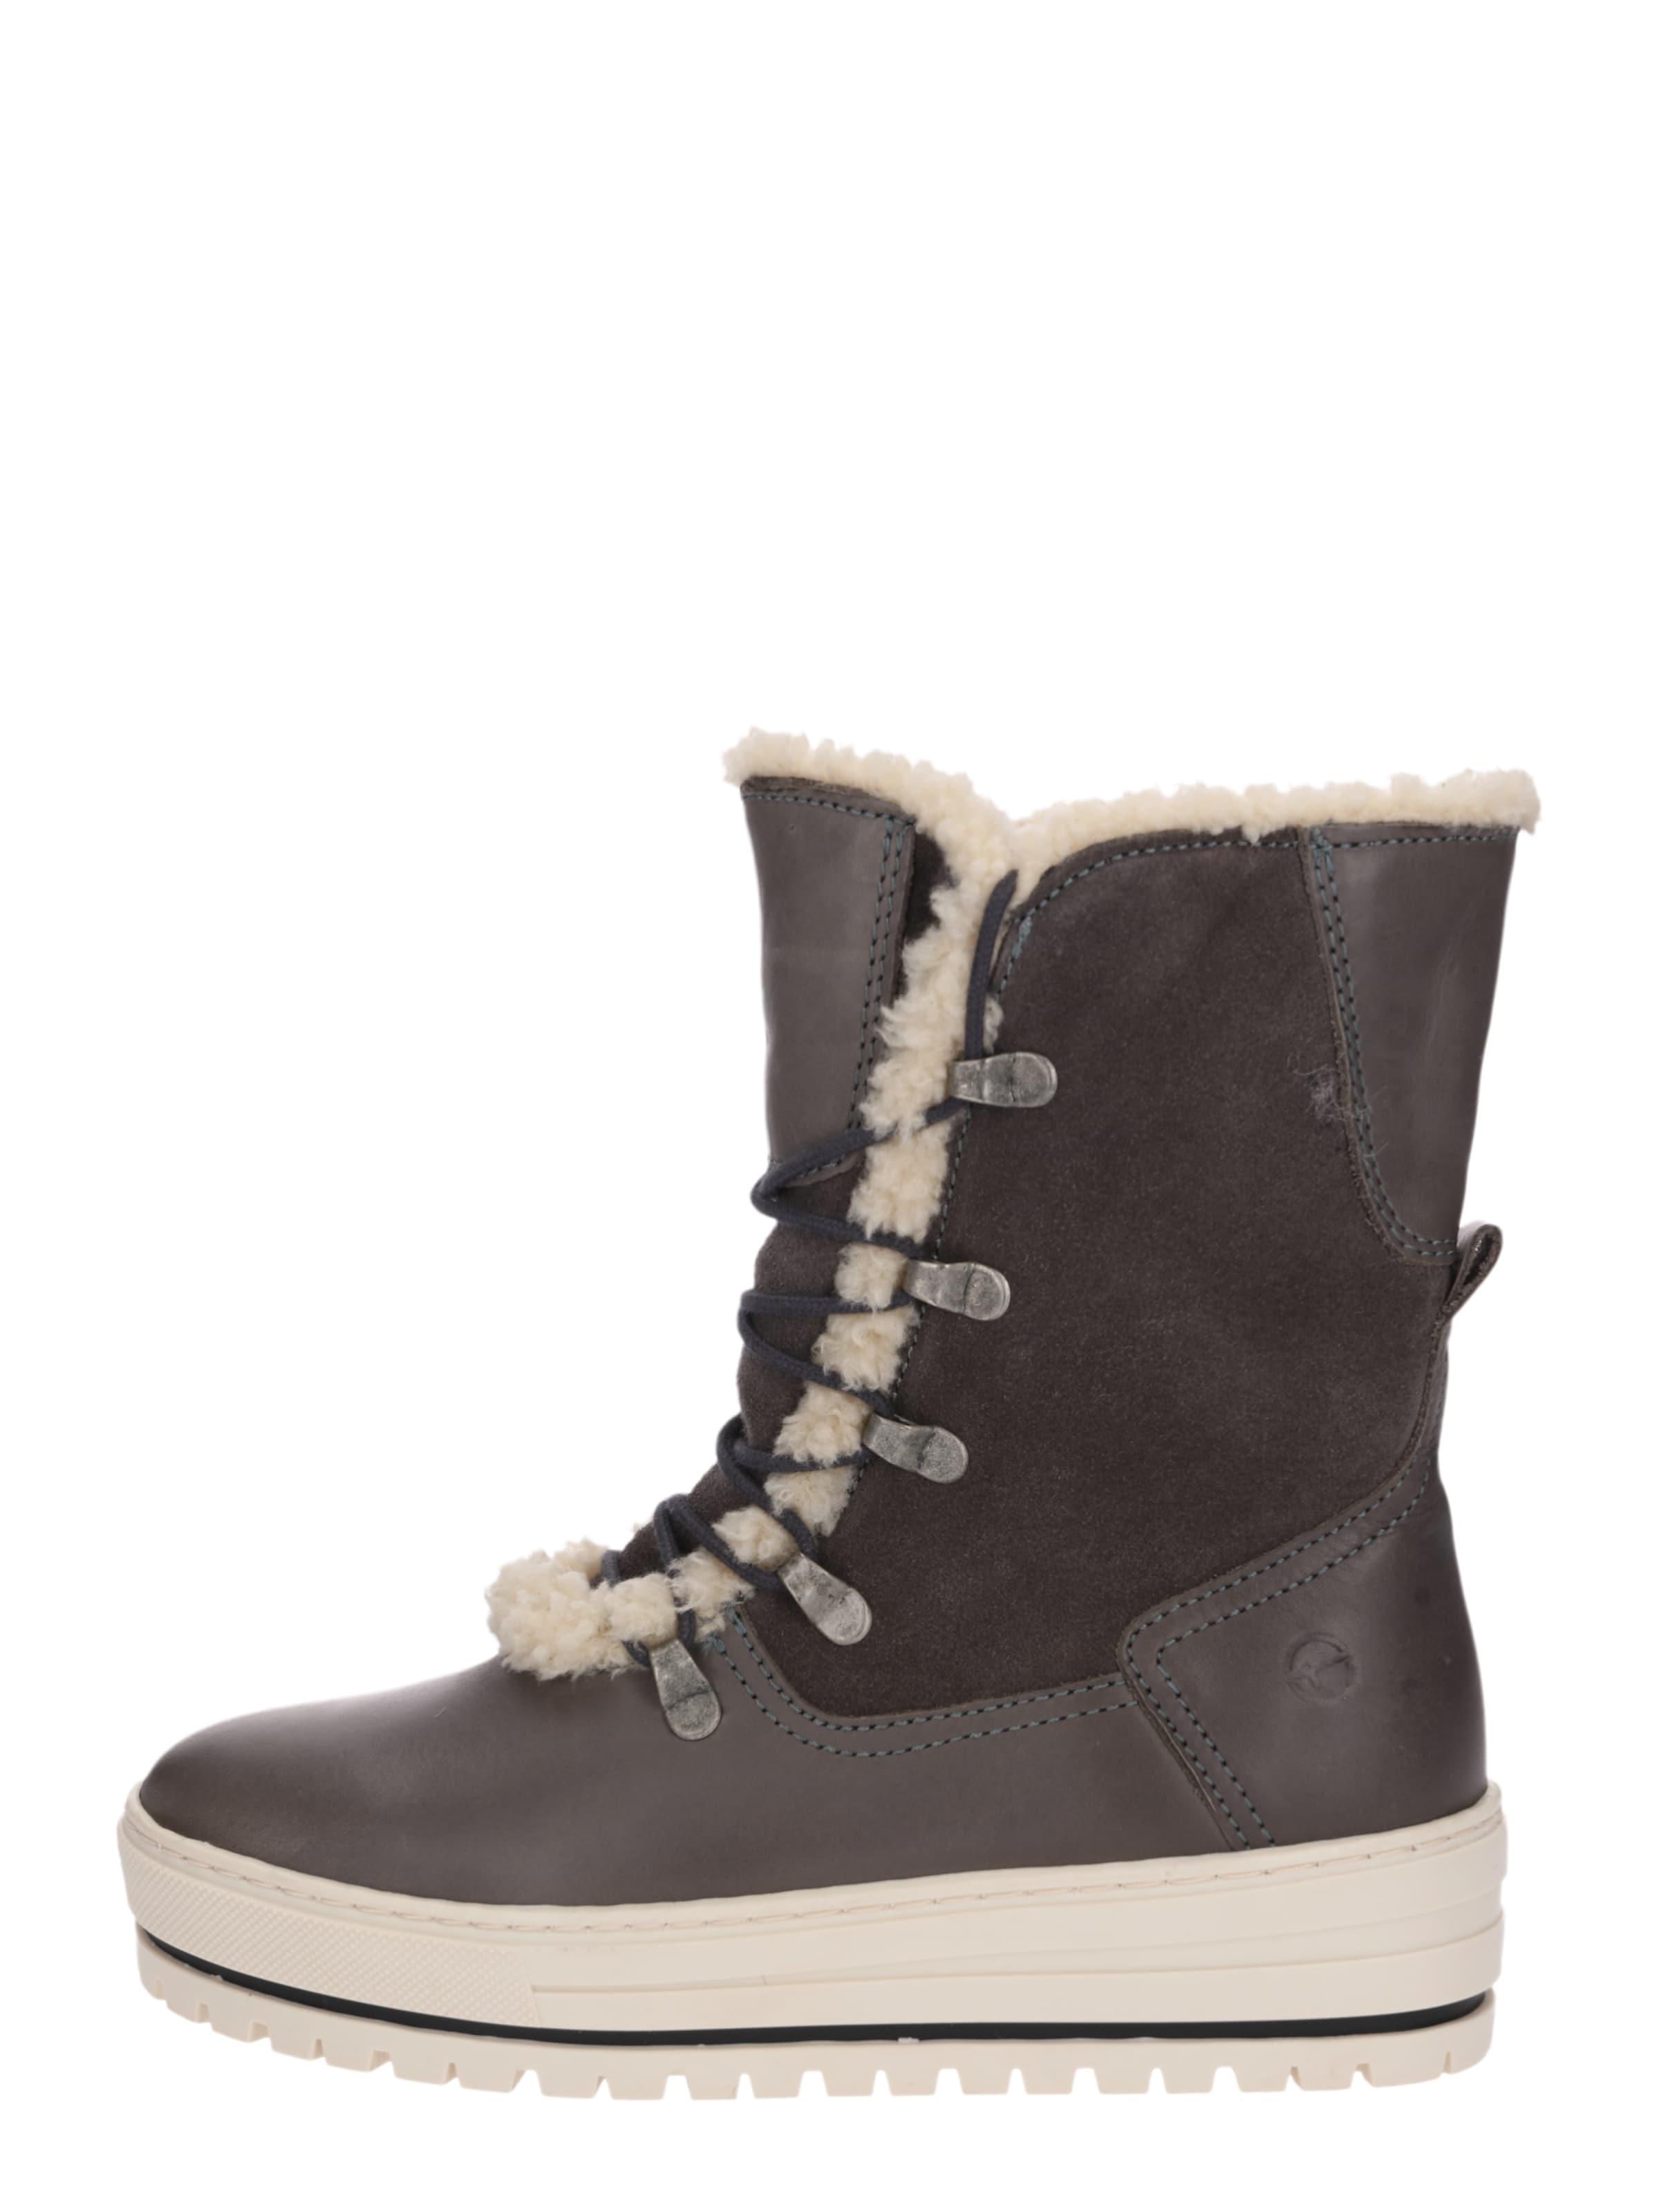 TAMARIS Stiefel 'Snowboots' taupe